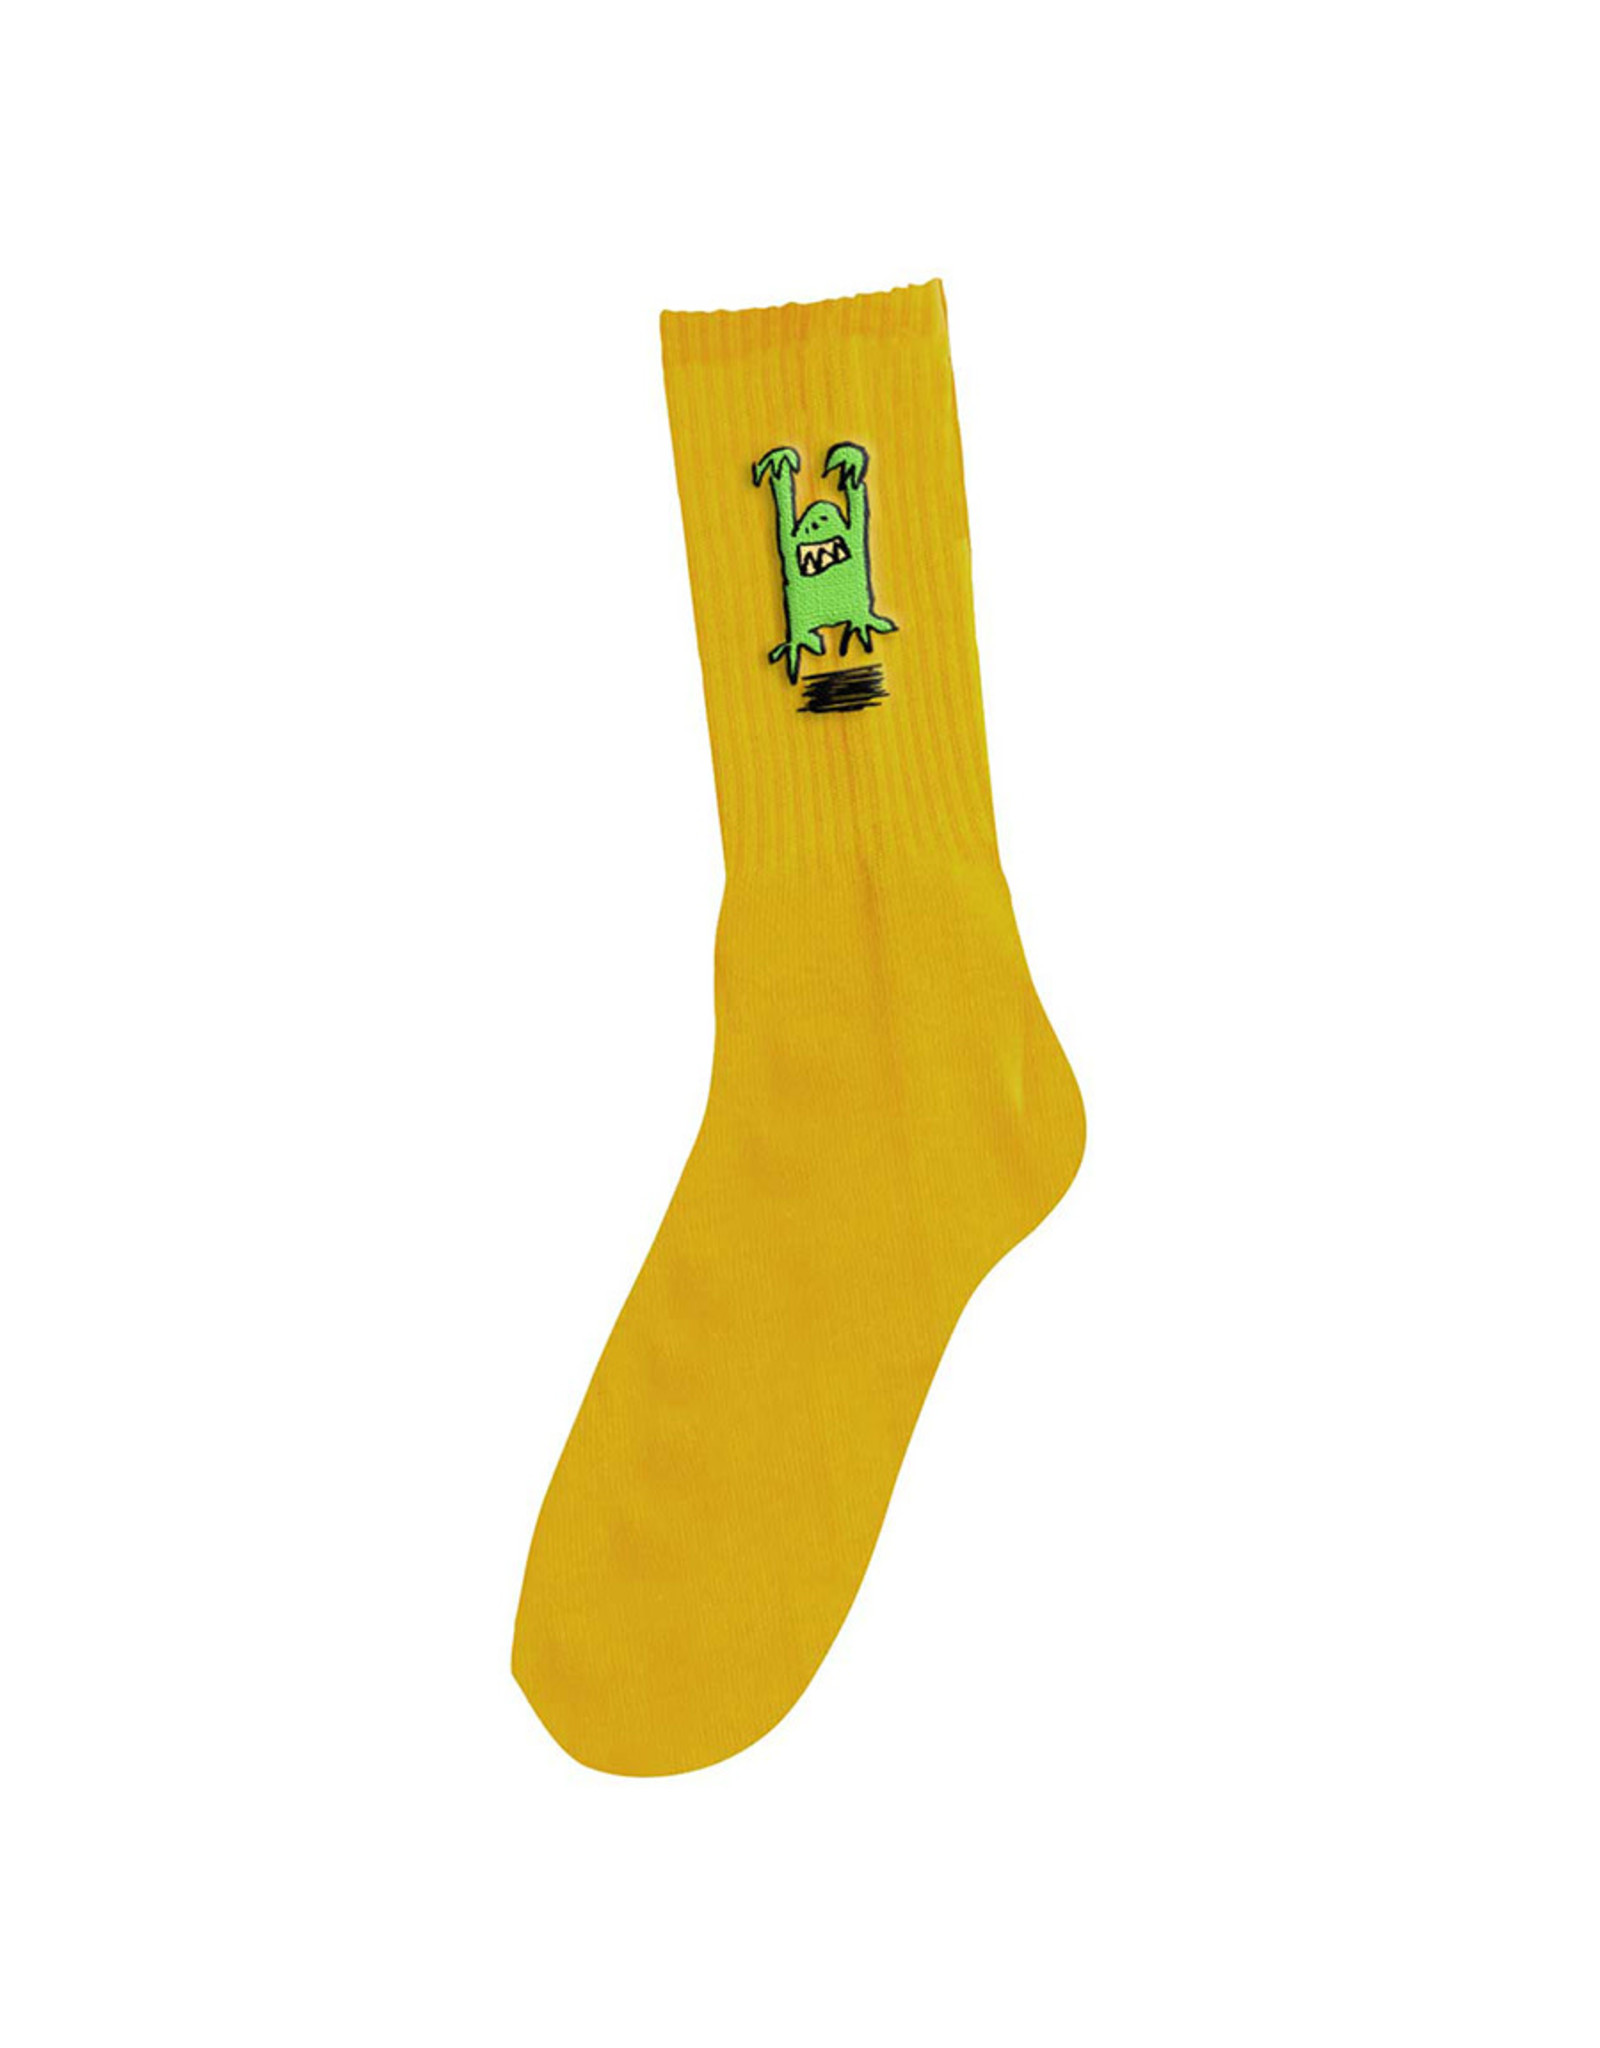 Foundation Foundation Socks Monster Crew (Yellow)